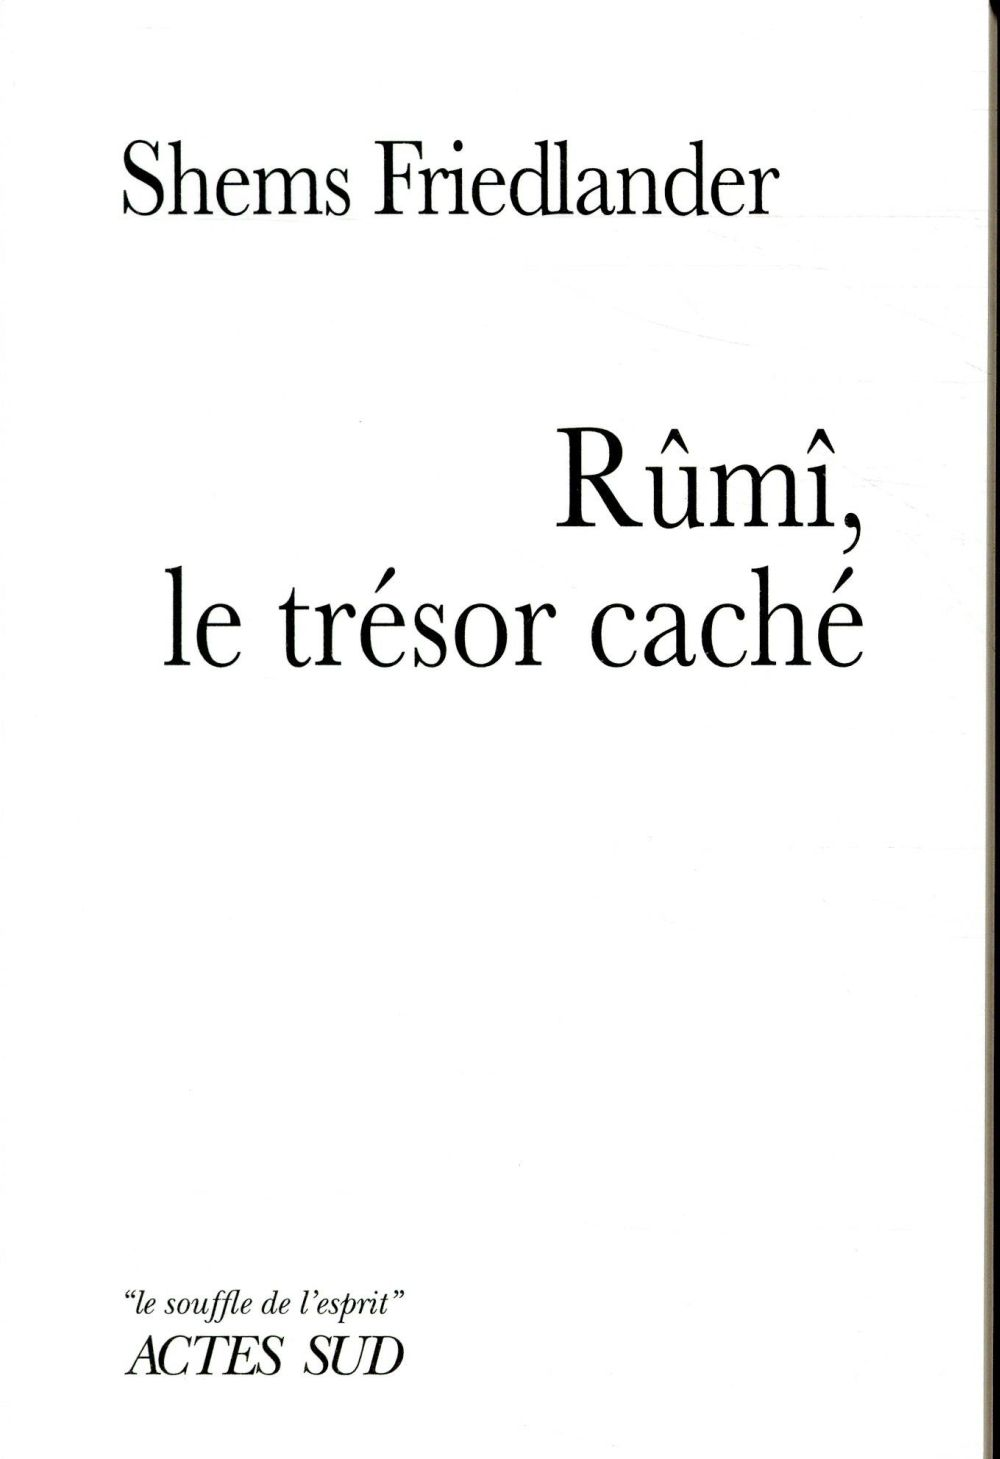 RUMI LE TRESOR CACHE FRIEDLANDER SHEMS/SA ACTES SUD